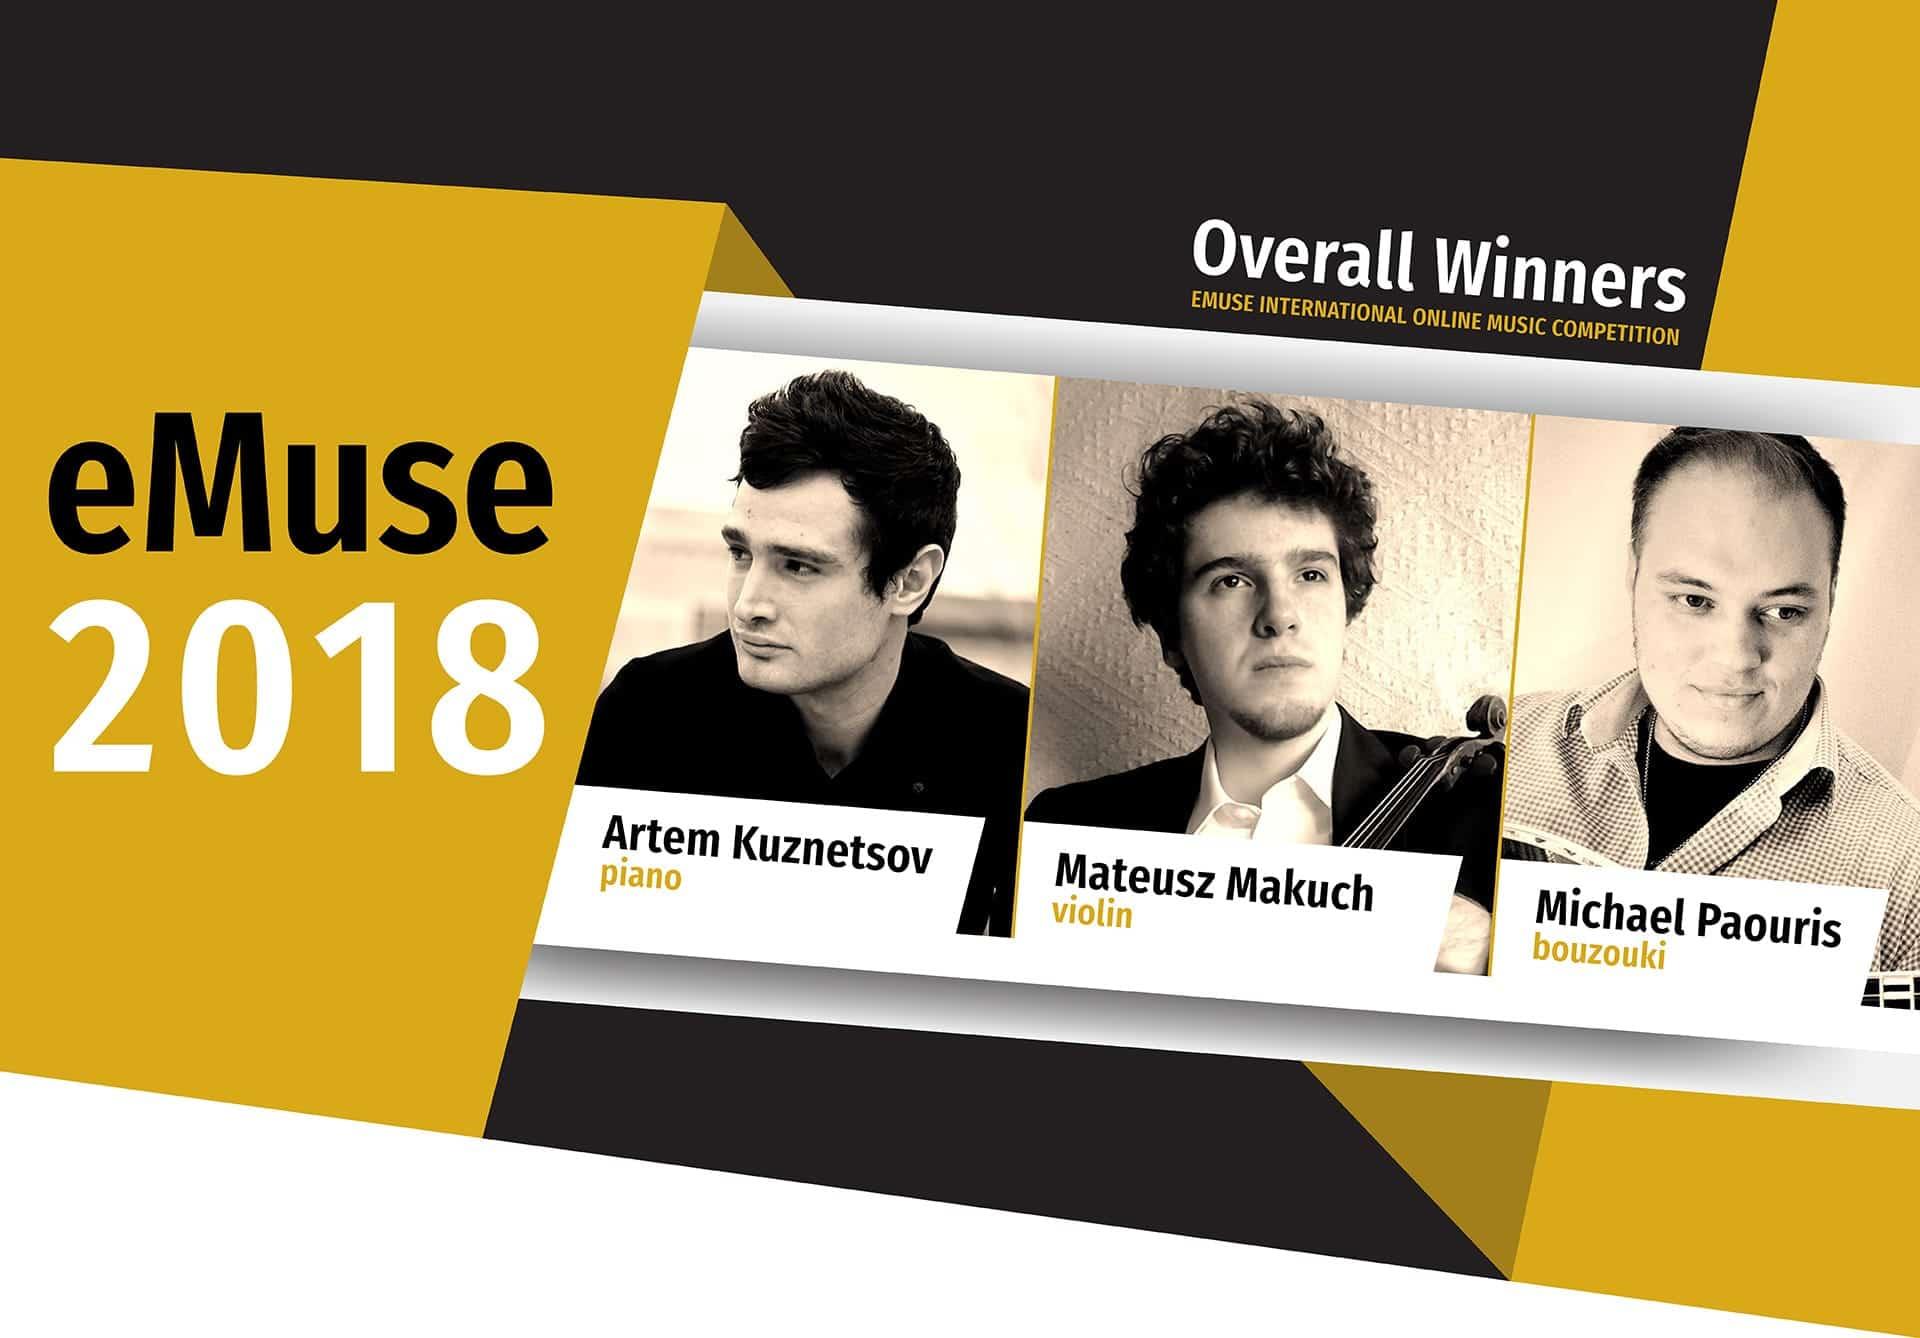 eMuse 2018 Overall Winners